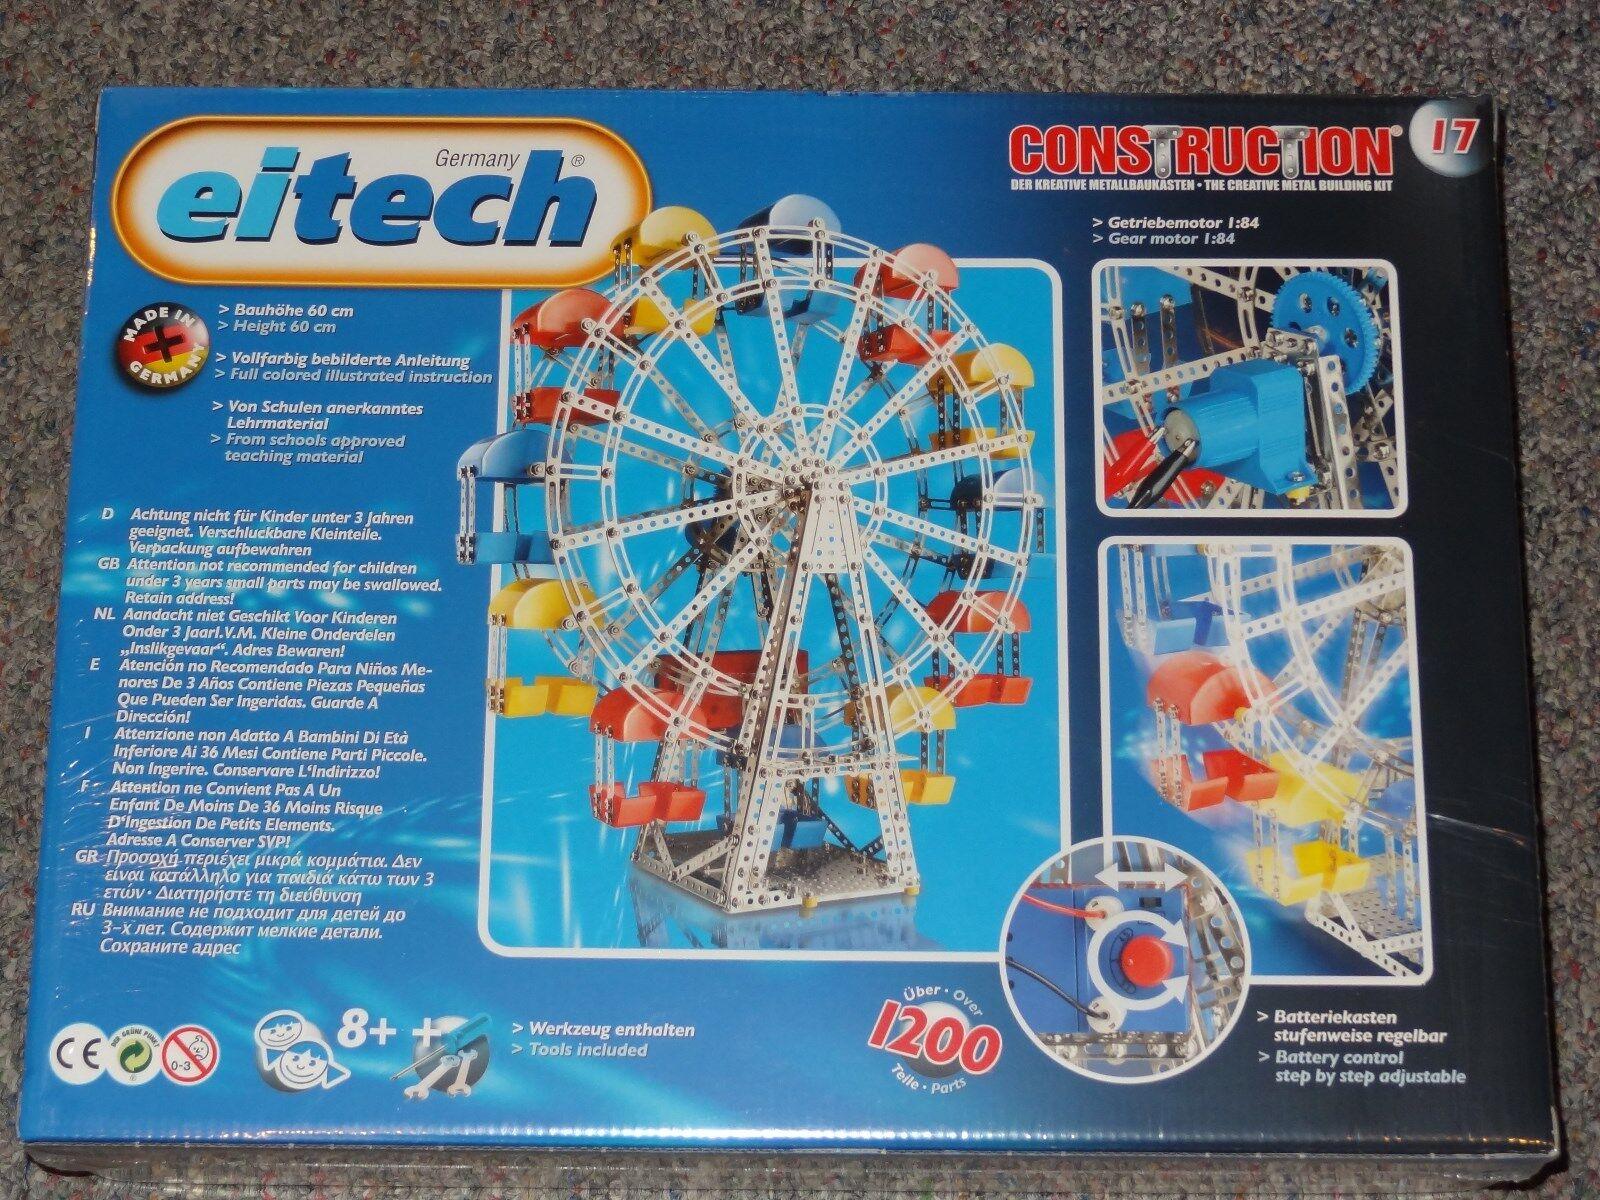 Ferris Wheel Eitech Eitech Eitech C17 Metal Construction Building Toy Steel Model a78651